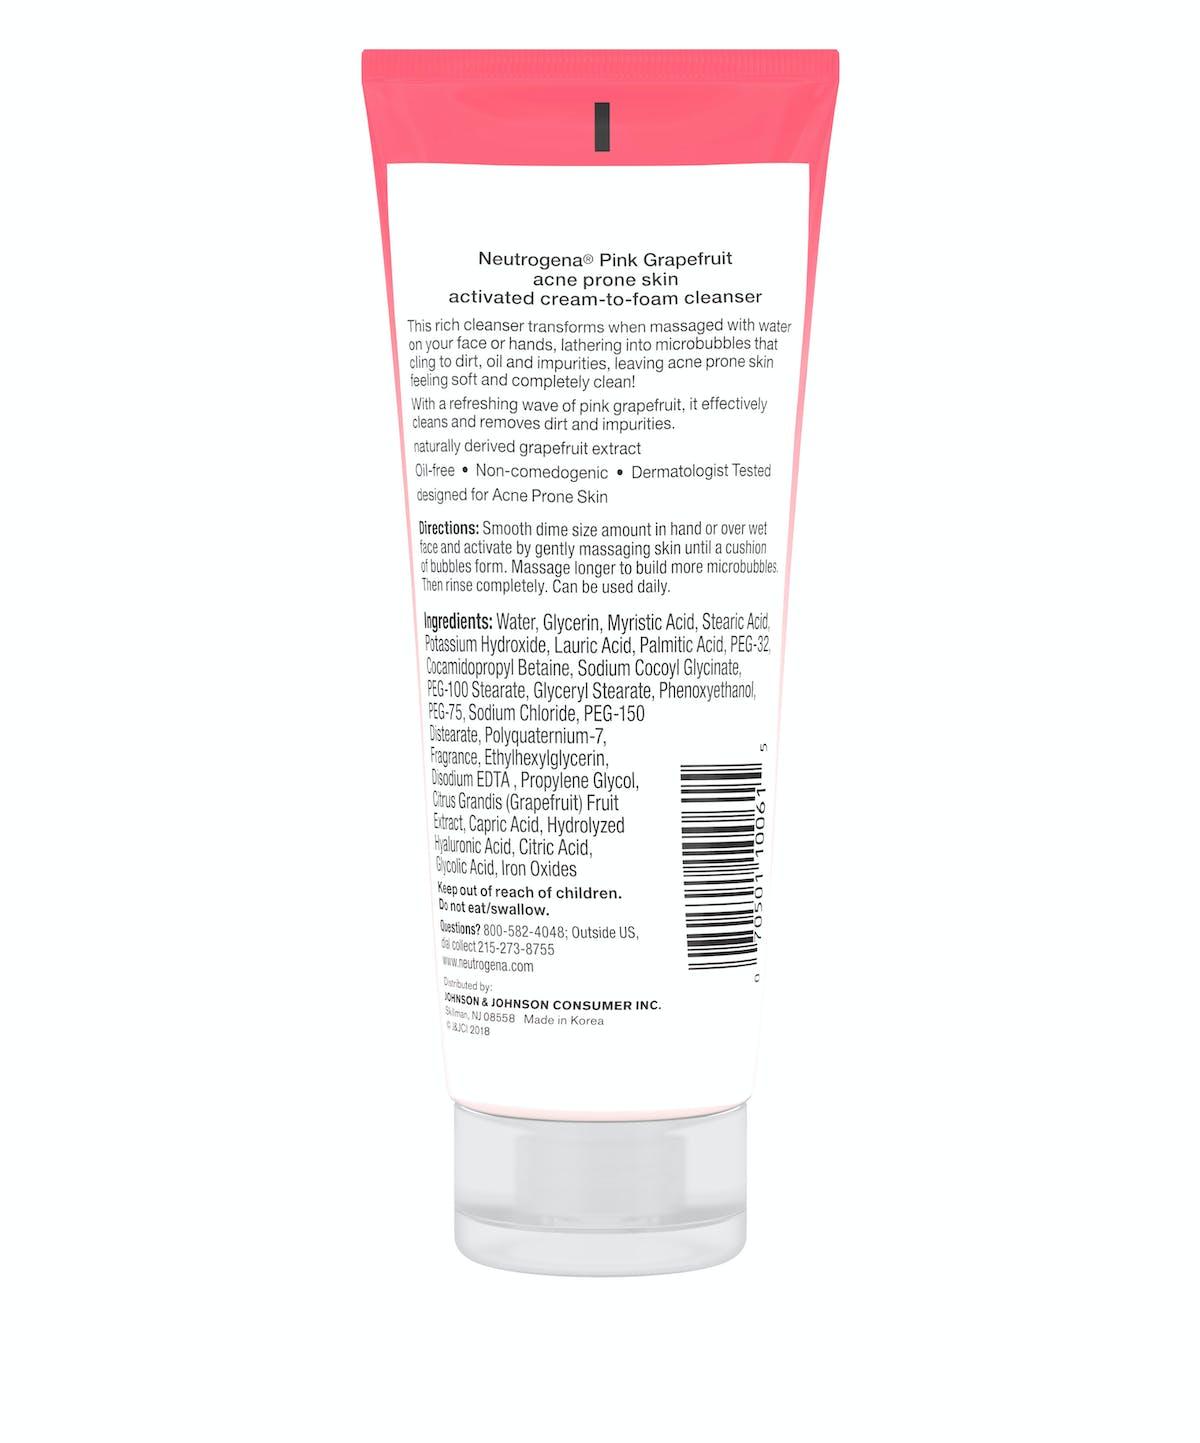 Neutrogena® Pink Grapefruit Acne Prone Skin Activated Cream-to-Foam Cleanser